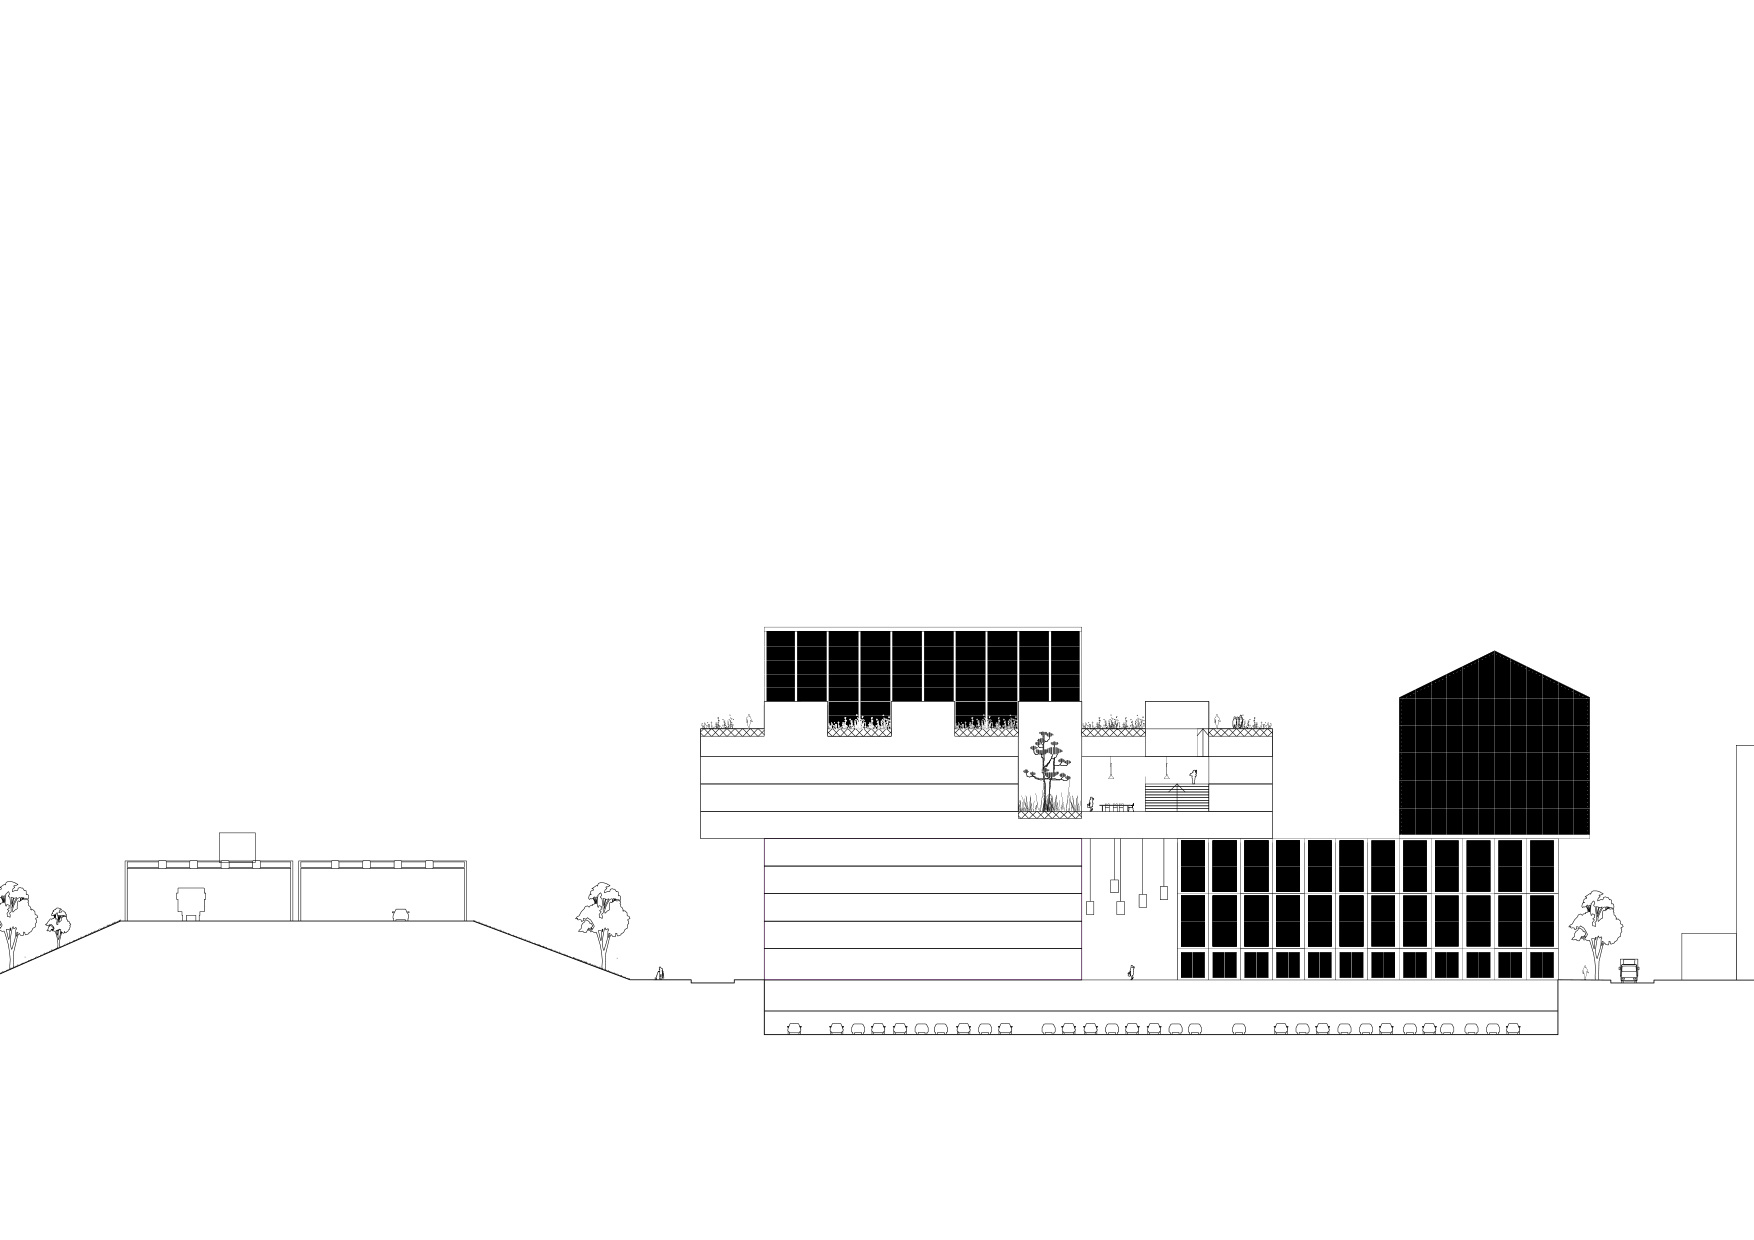 <p>Dwarsdoorsnede met tuin auditorium en loopbaan op het dak</p>